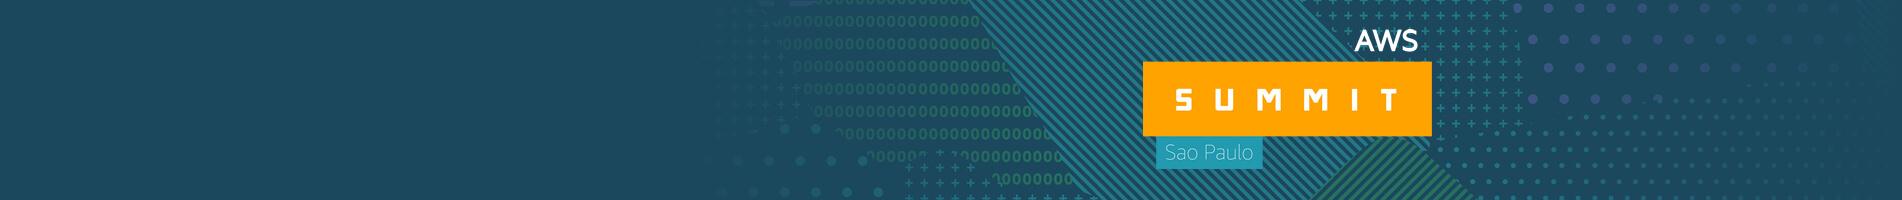 AWS Summit 2017 SP - Mandic Cloud